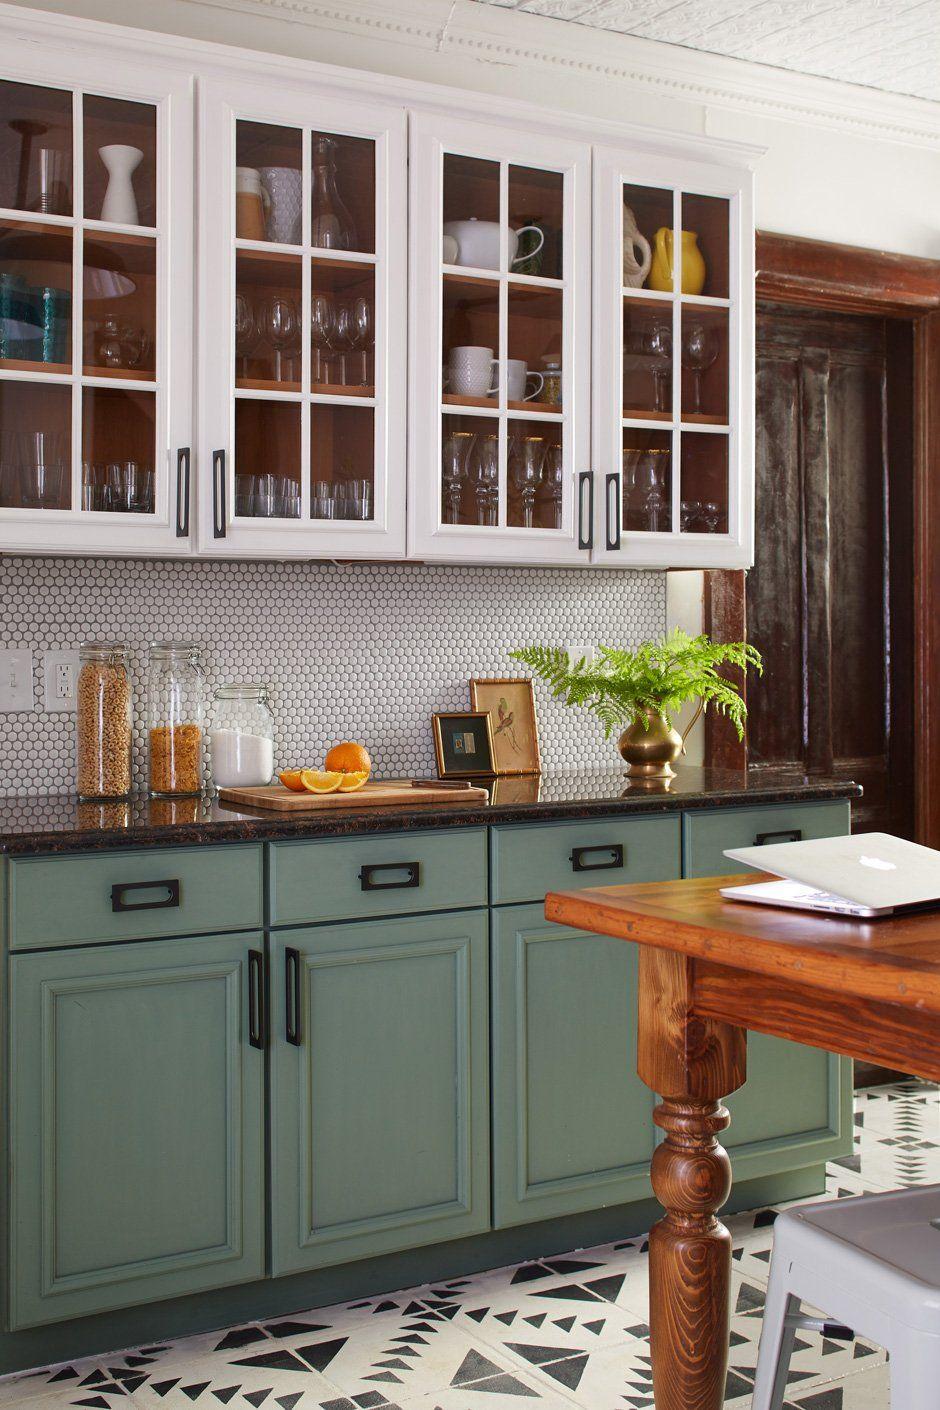 South Orange Residence In 2019 Nest Studio Interiors Kitchen